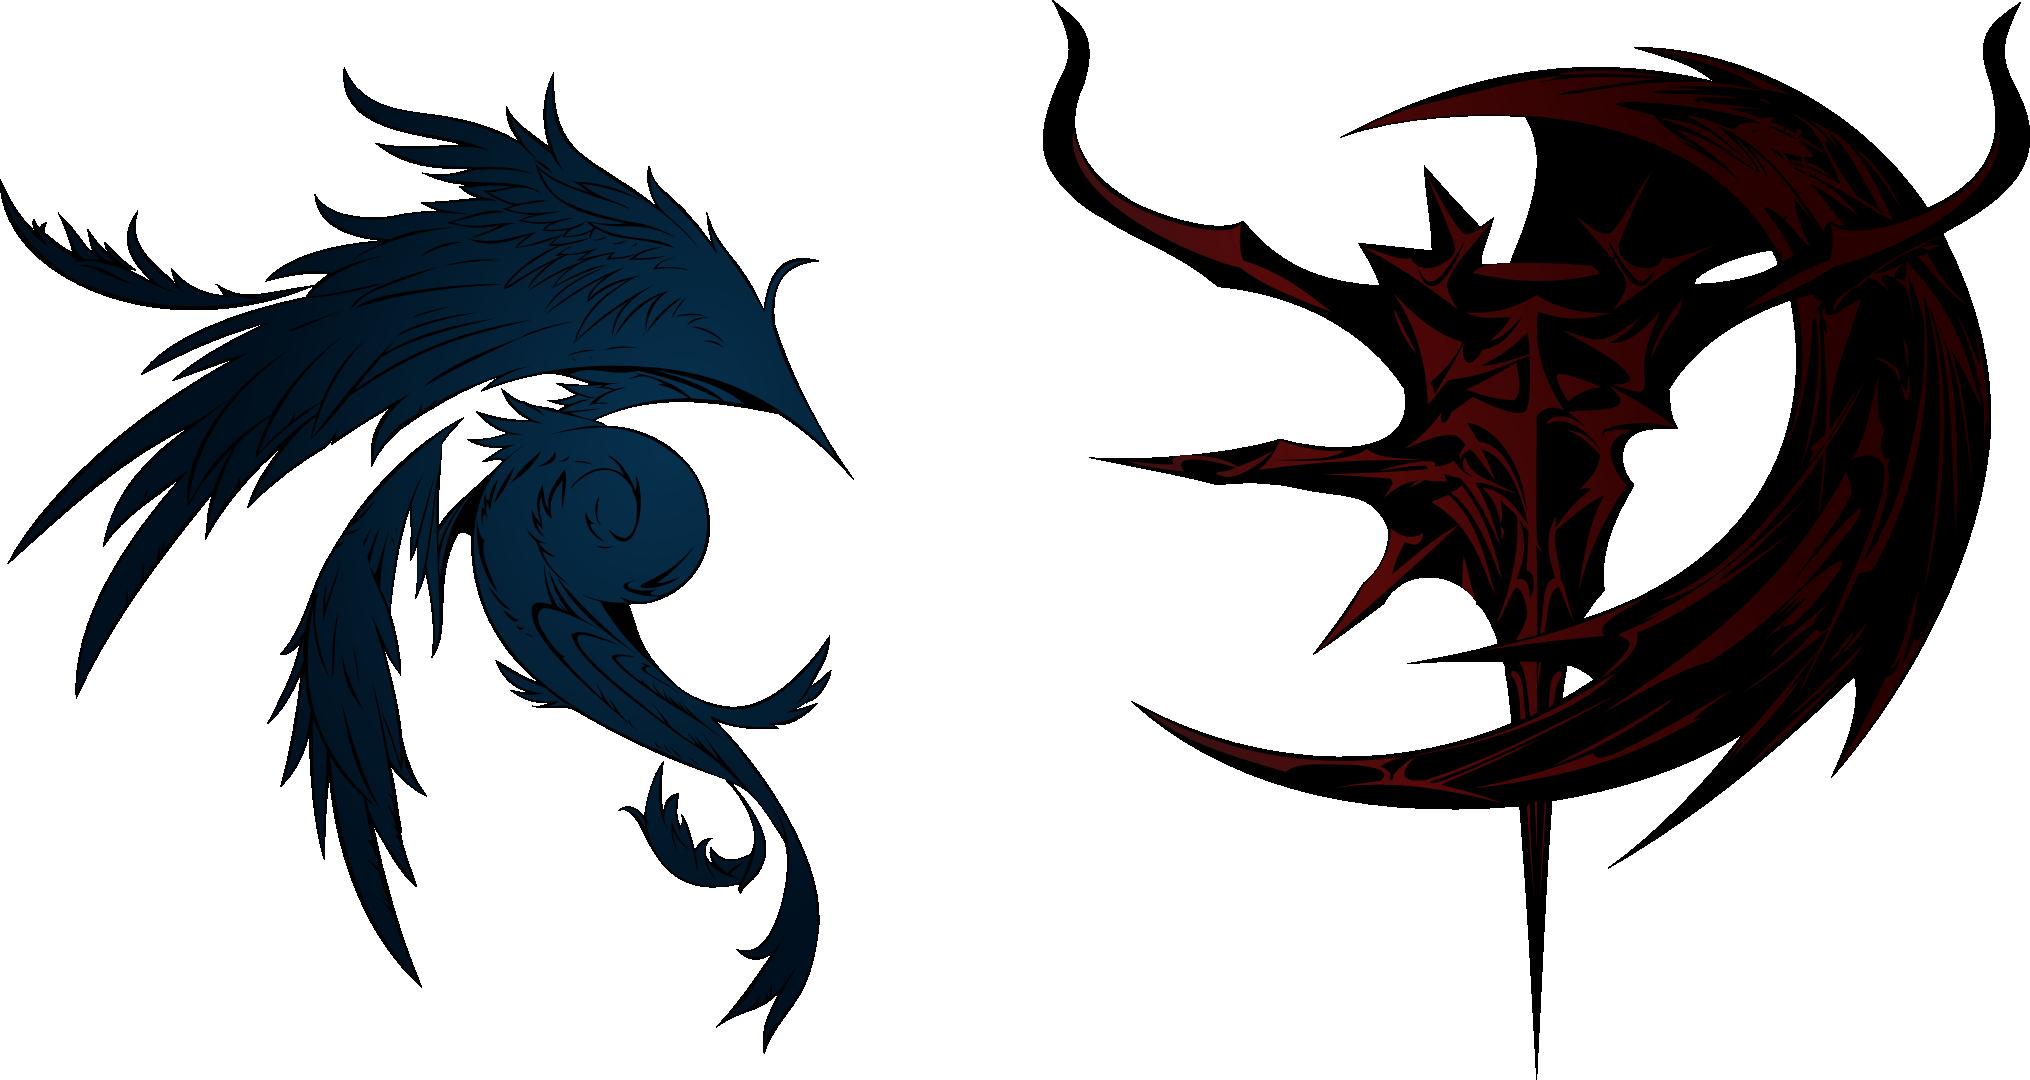 Final fantasy logo art - photo#26